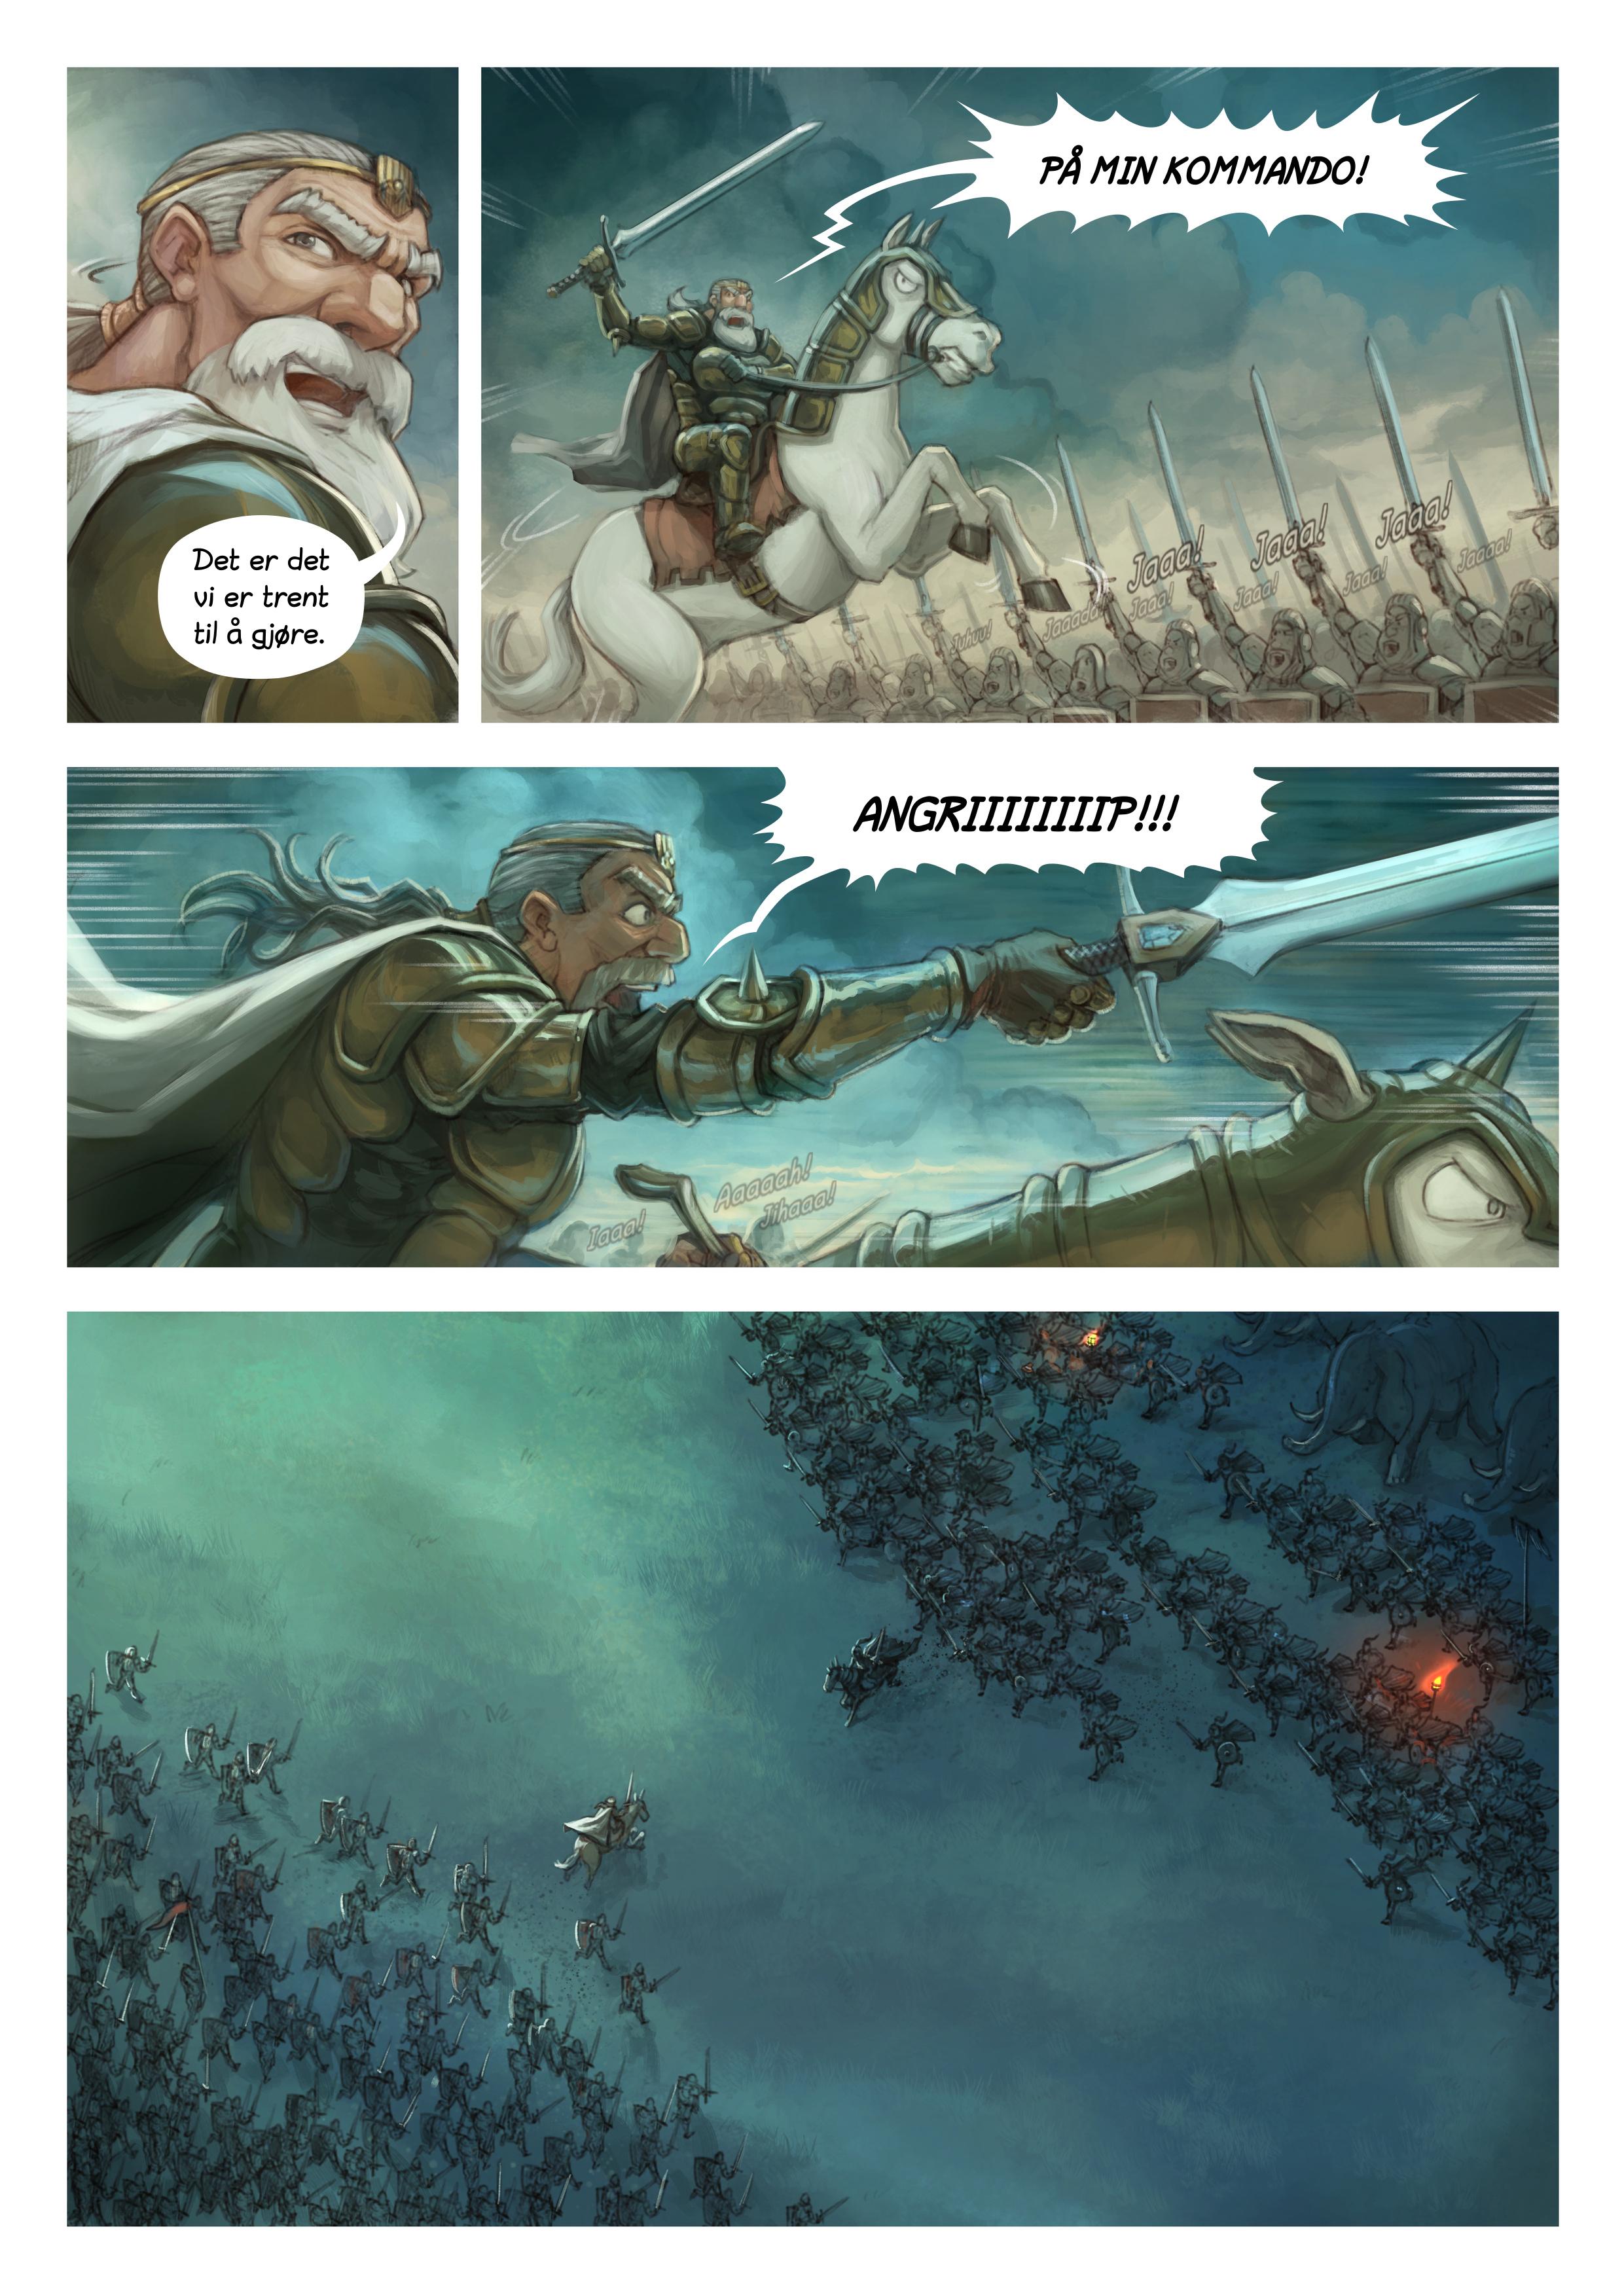 Episode 33: Krigsformelen, Page 4